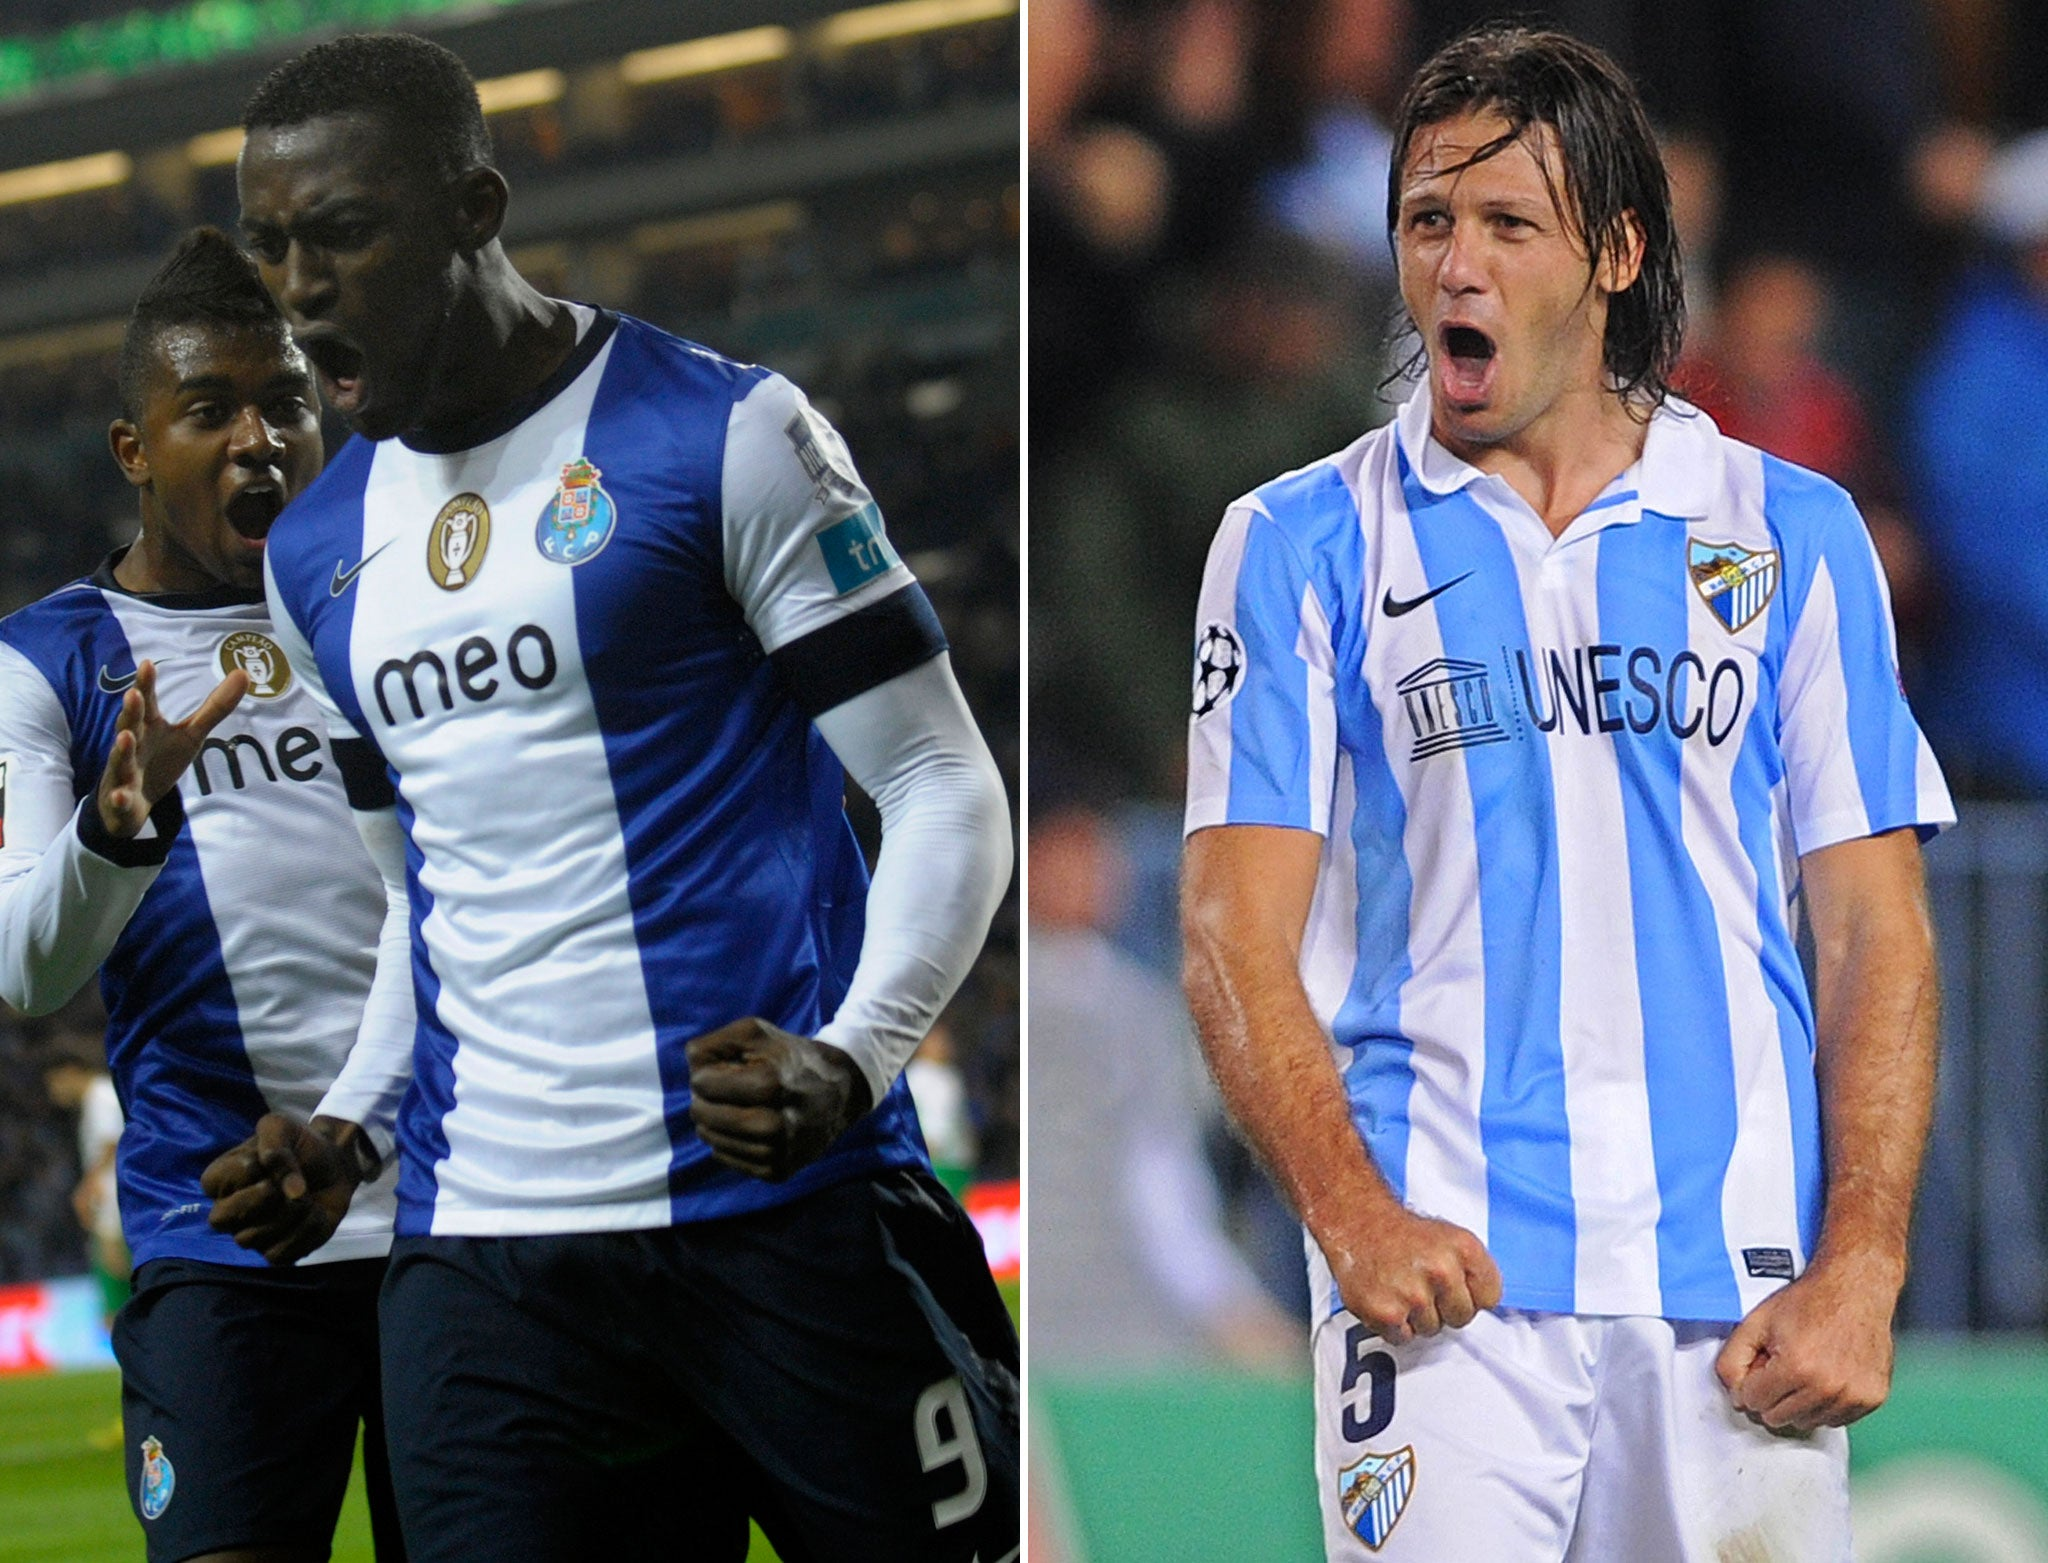 Porto v malaga betting preview goal hawks vs knicks betting expert nfl